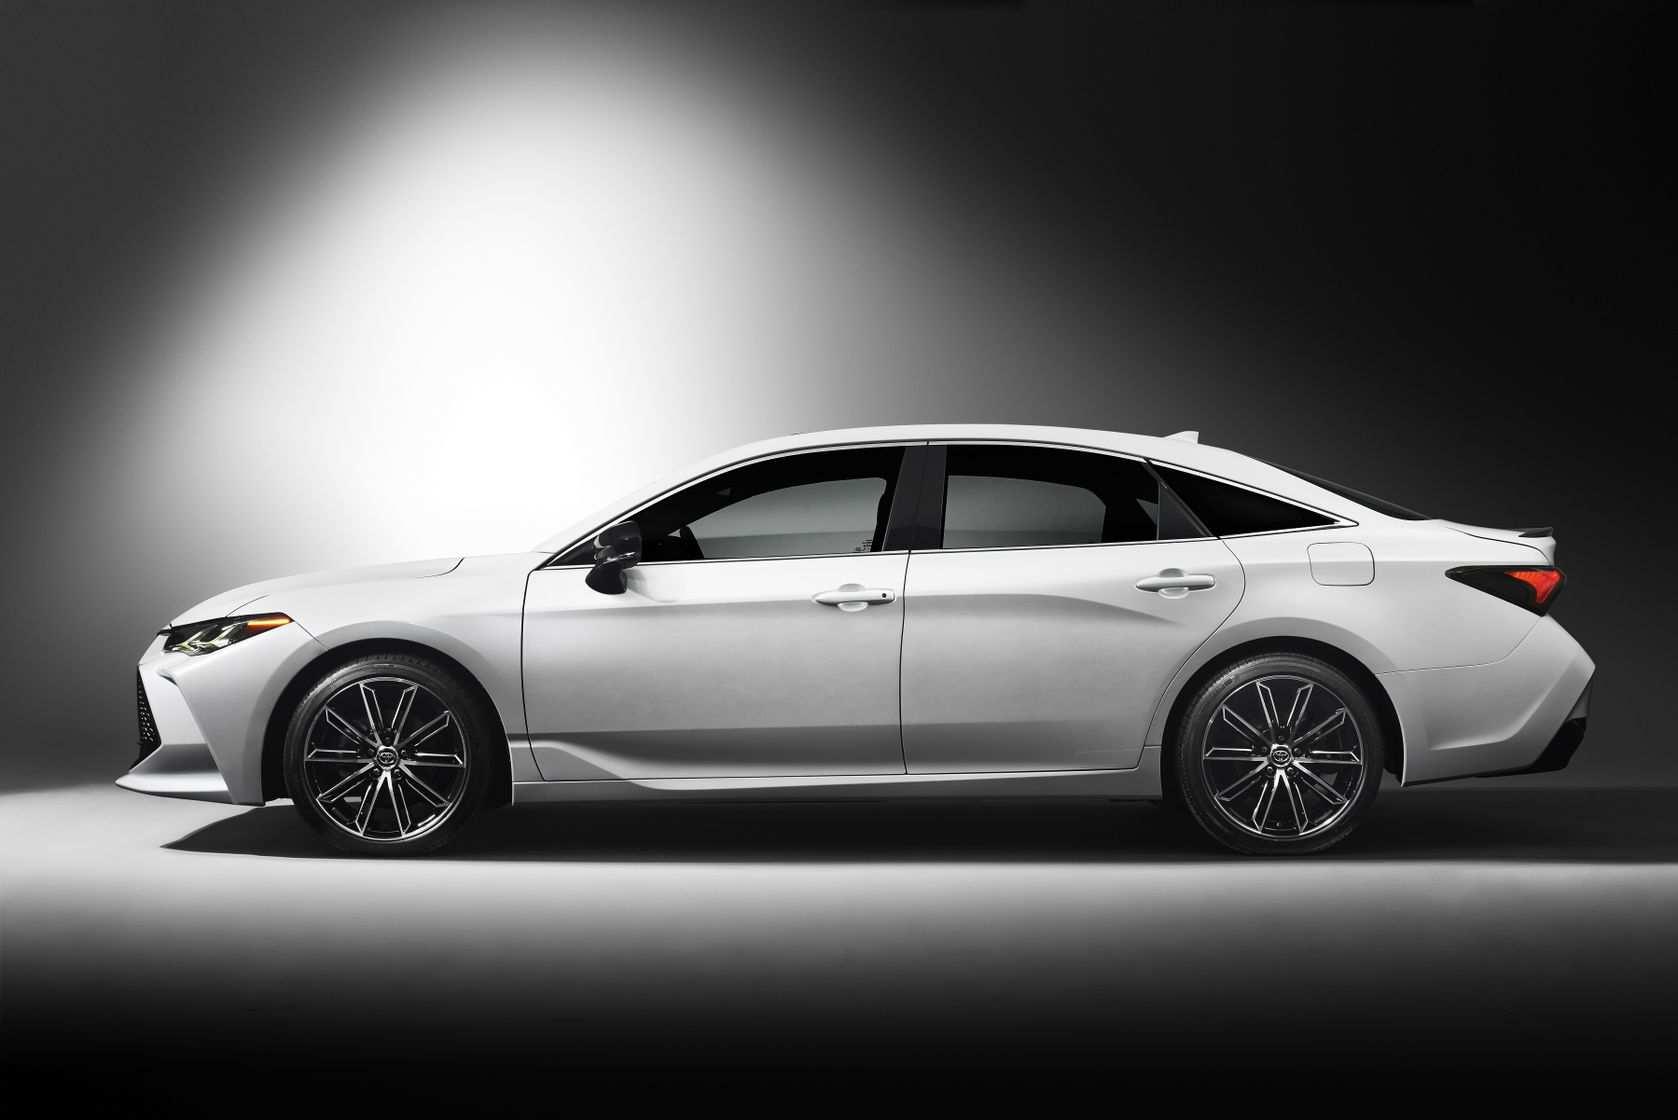 33 Concept of New Lexus Vs Avalon 2019 Performance Photos with New Lexus Vs Avalon 2019 Performance